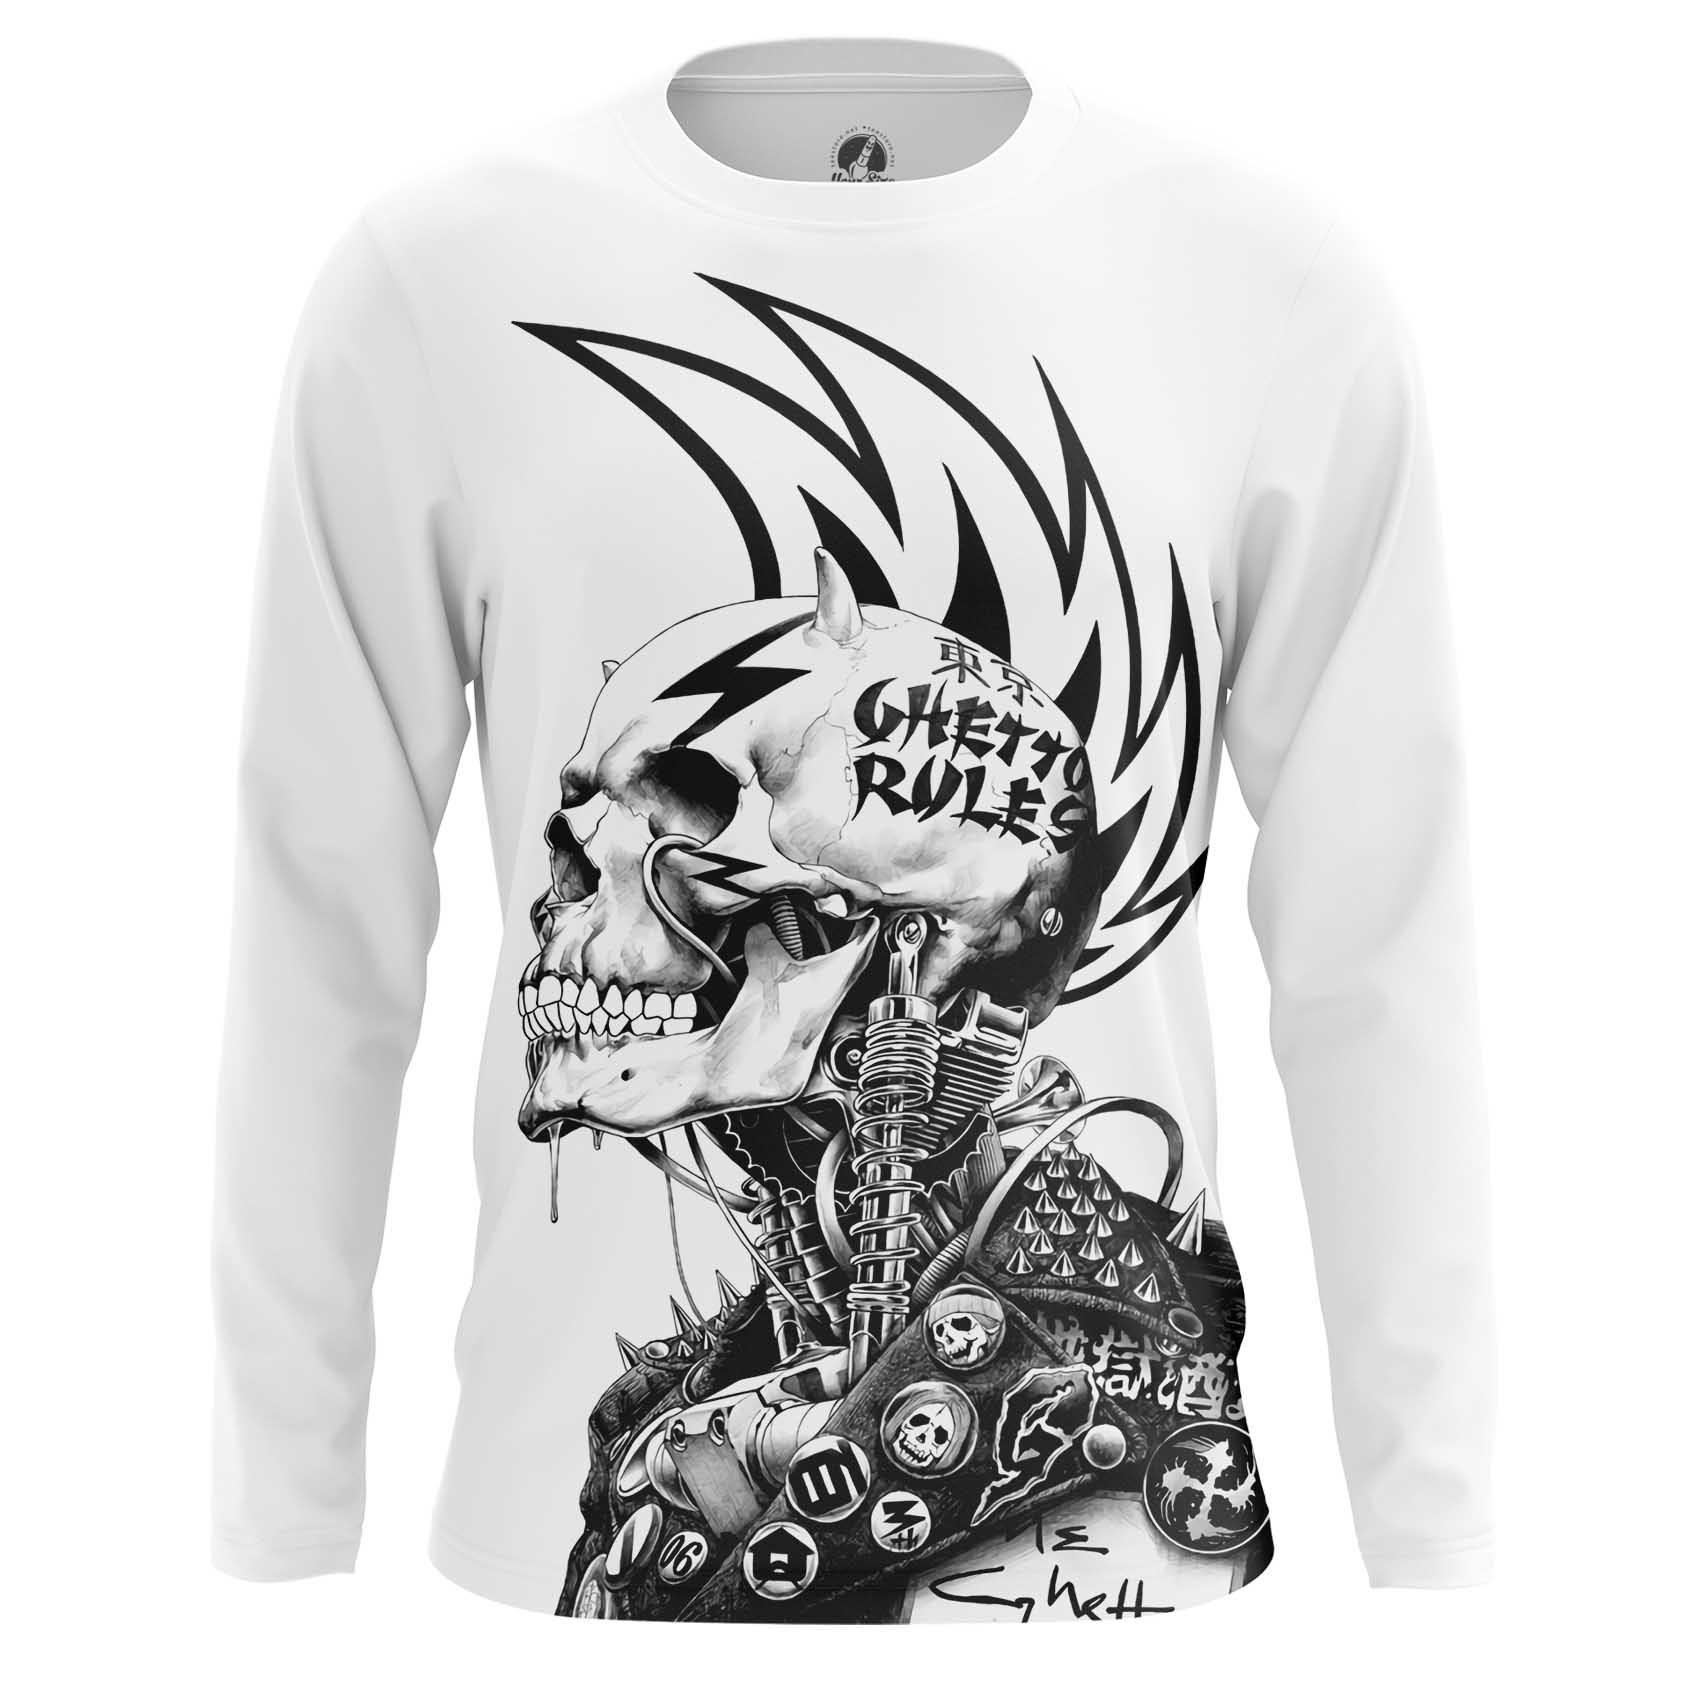 Merch T-Shirt Ghetto Rules Punk Skeleton Iroquois